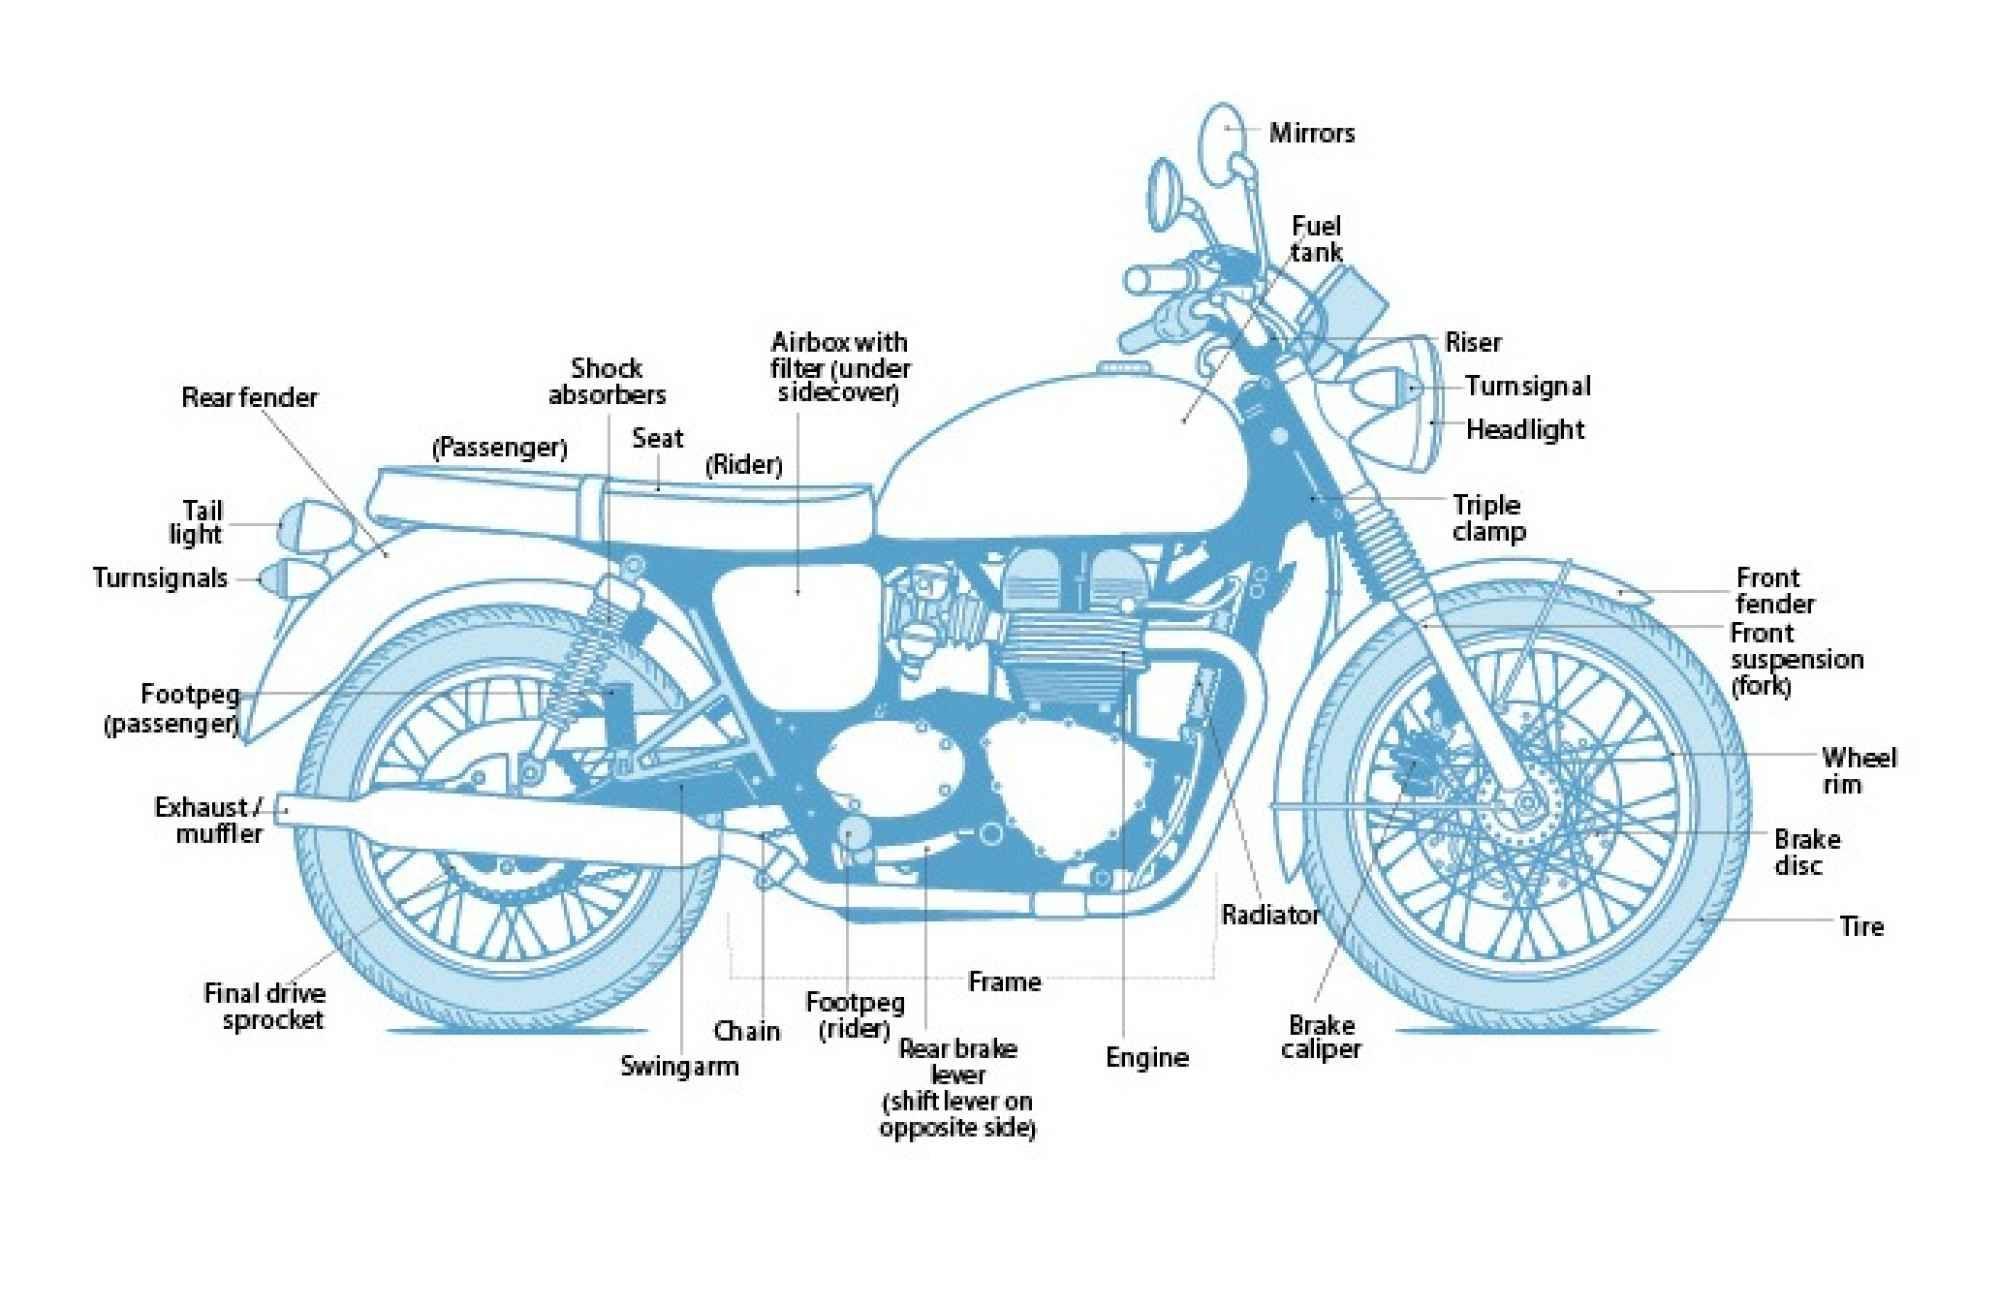 motorcycle diagram motorcycles cafe racer bikes motorcycle harley davidson motorcycle engine diagram harley davidson motorcycle diagrams [ 2000 x 1308 Pixel ]